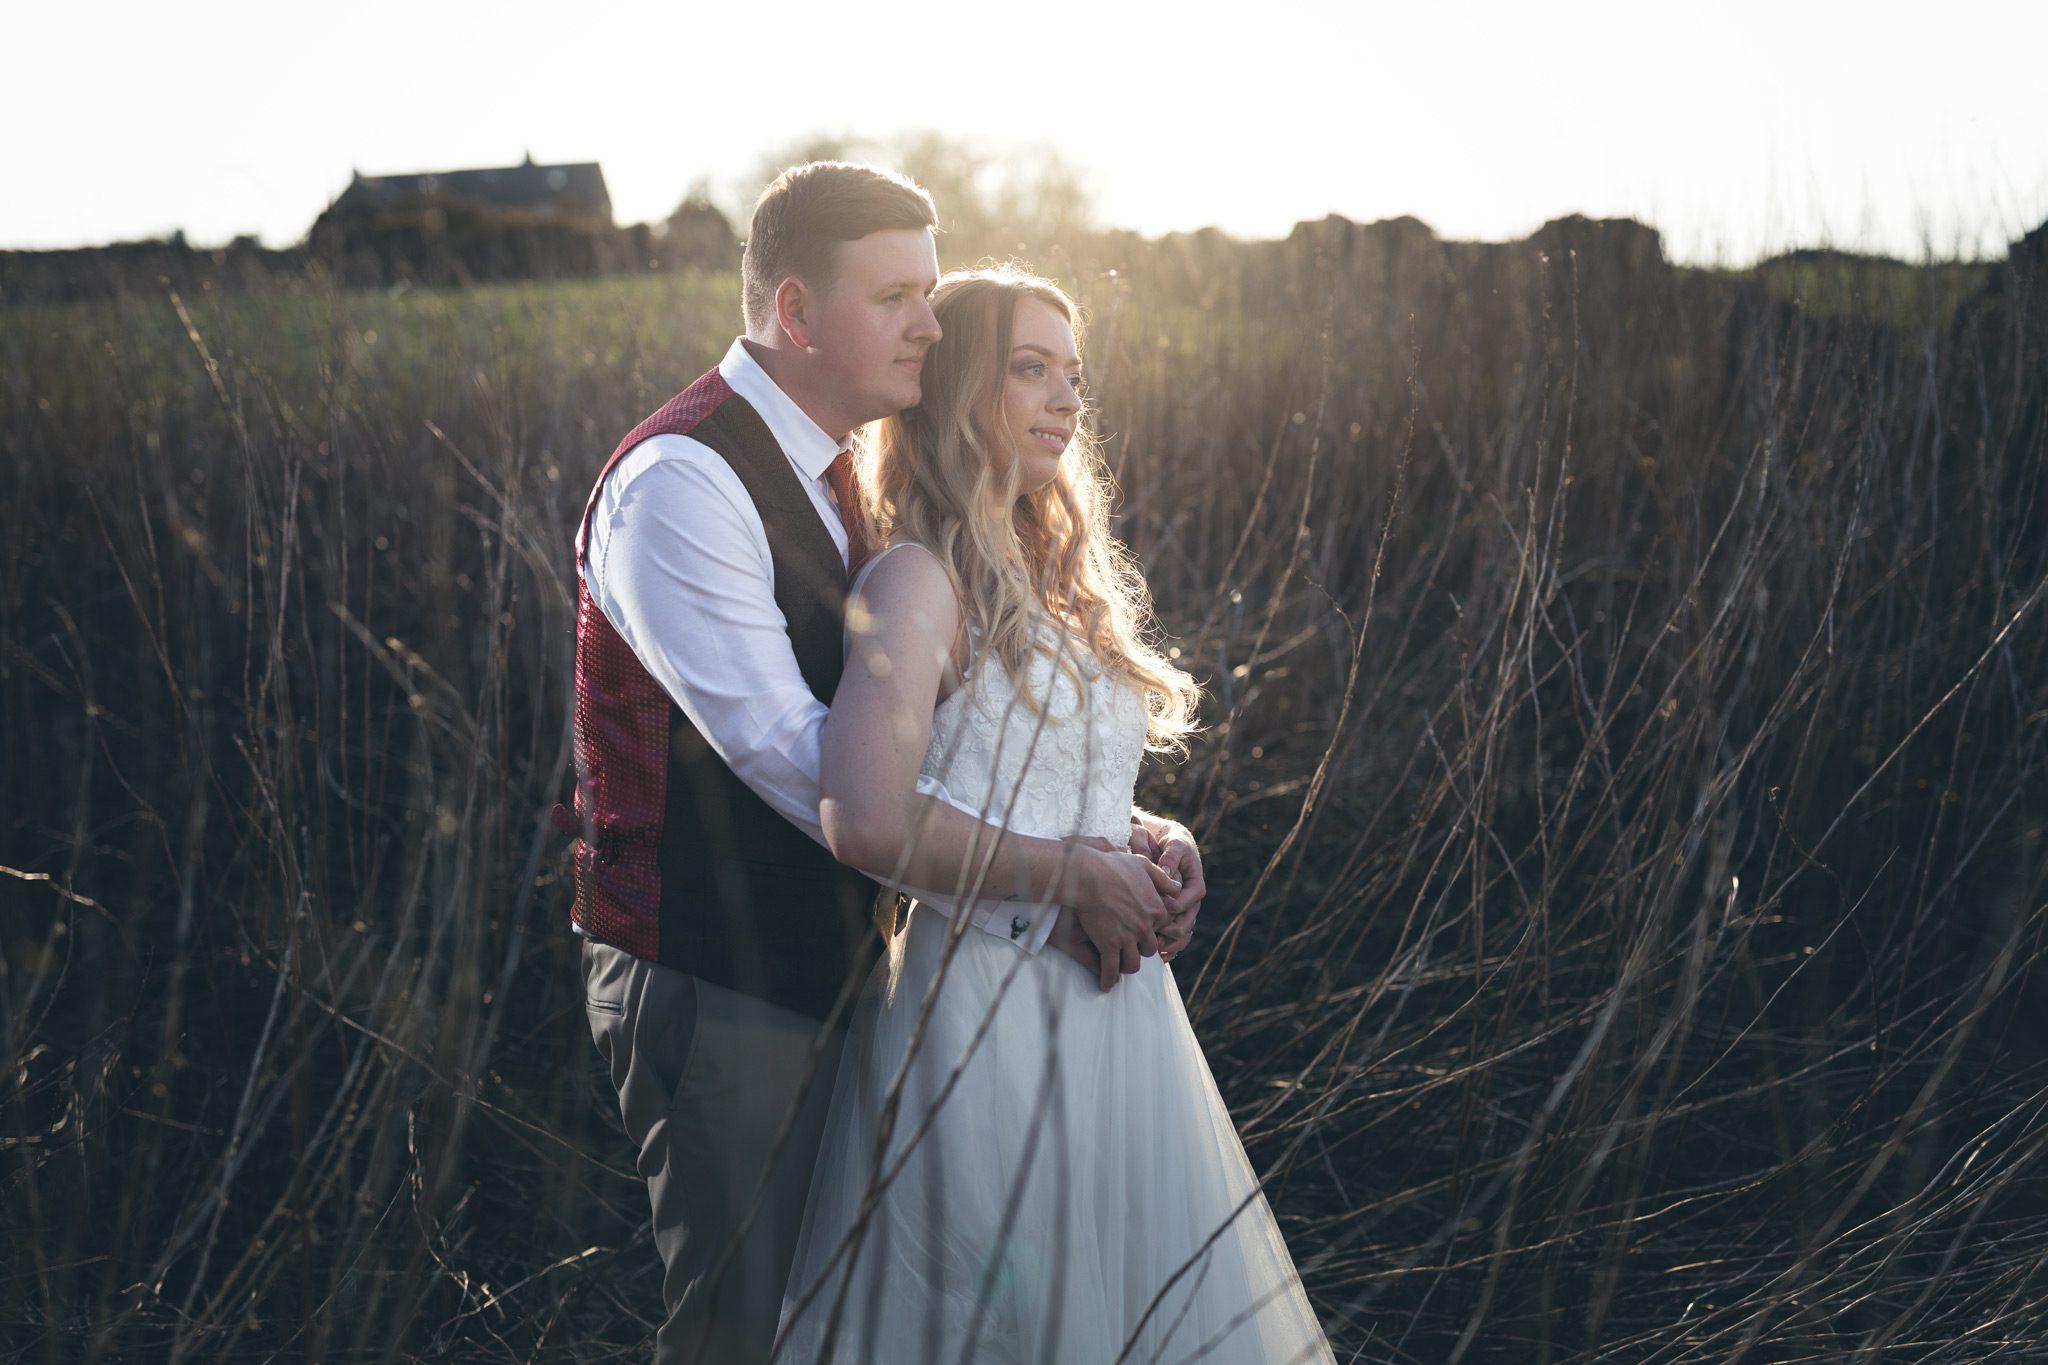 The Fox and Goose Inn Wedding Photos